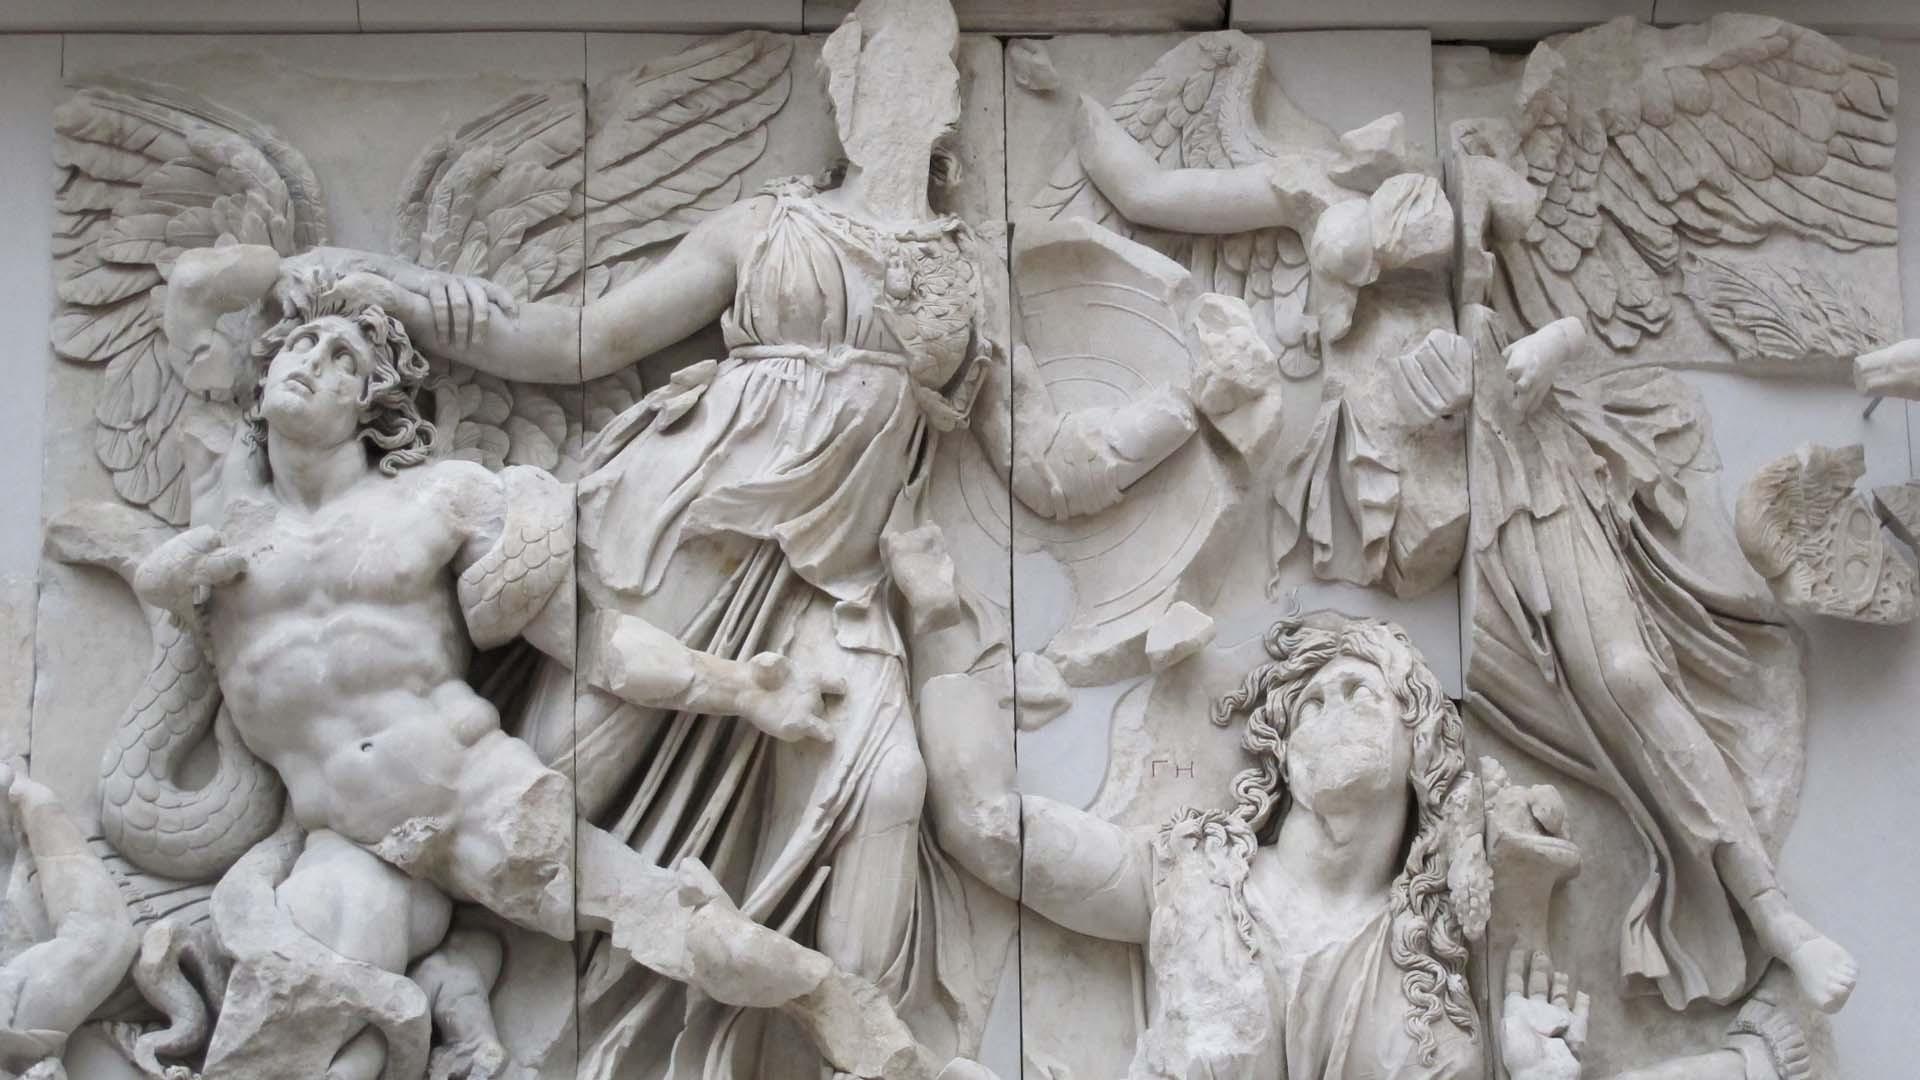 Goddess of wisdom and strategy sculpture Goddess Athena statue ancient Greek